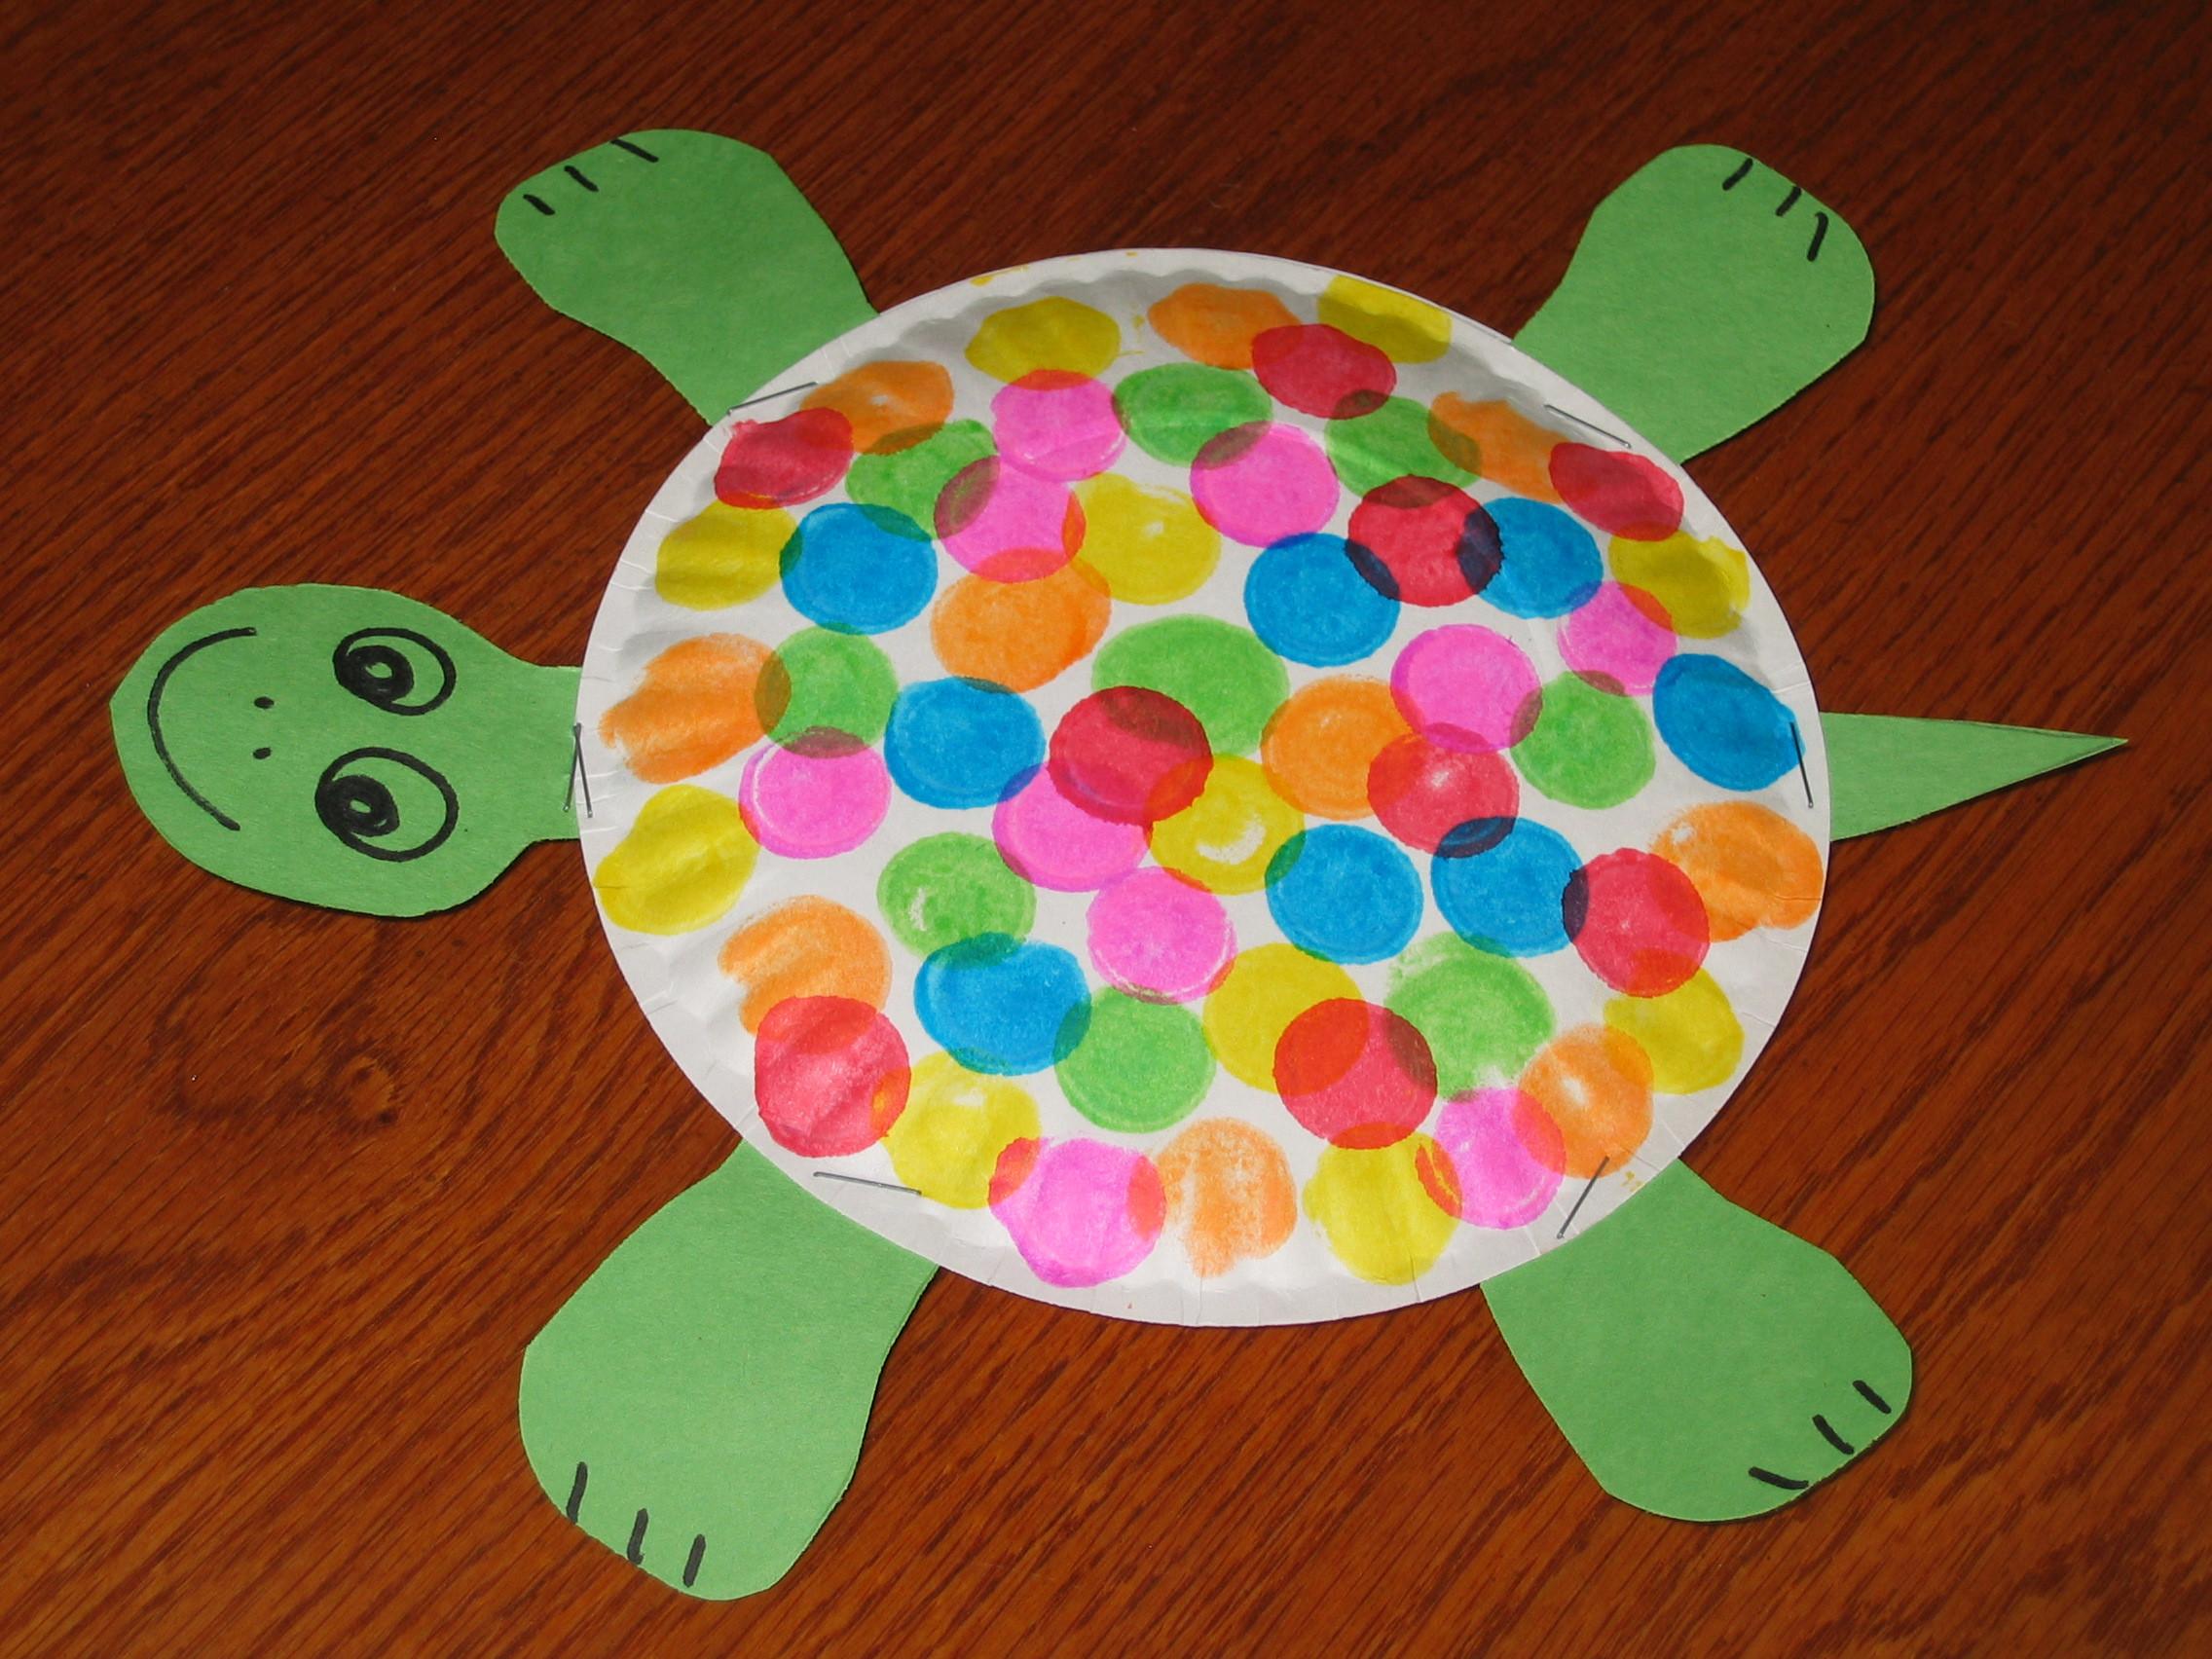 Preschool Arts And Crafts Ideas  40 Fun and Fantastic Paper Plate Crafts